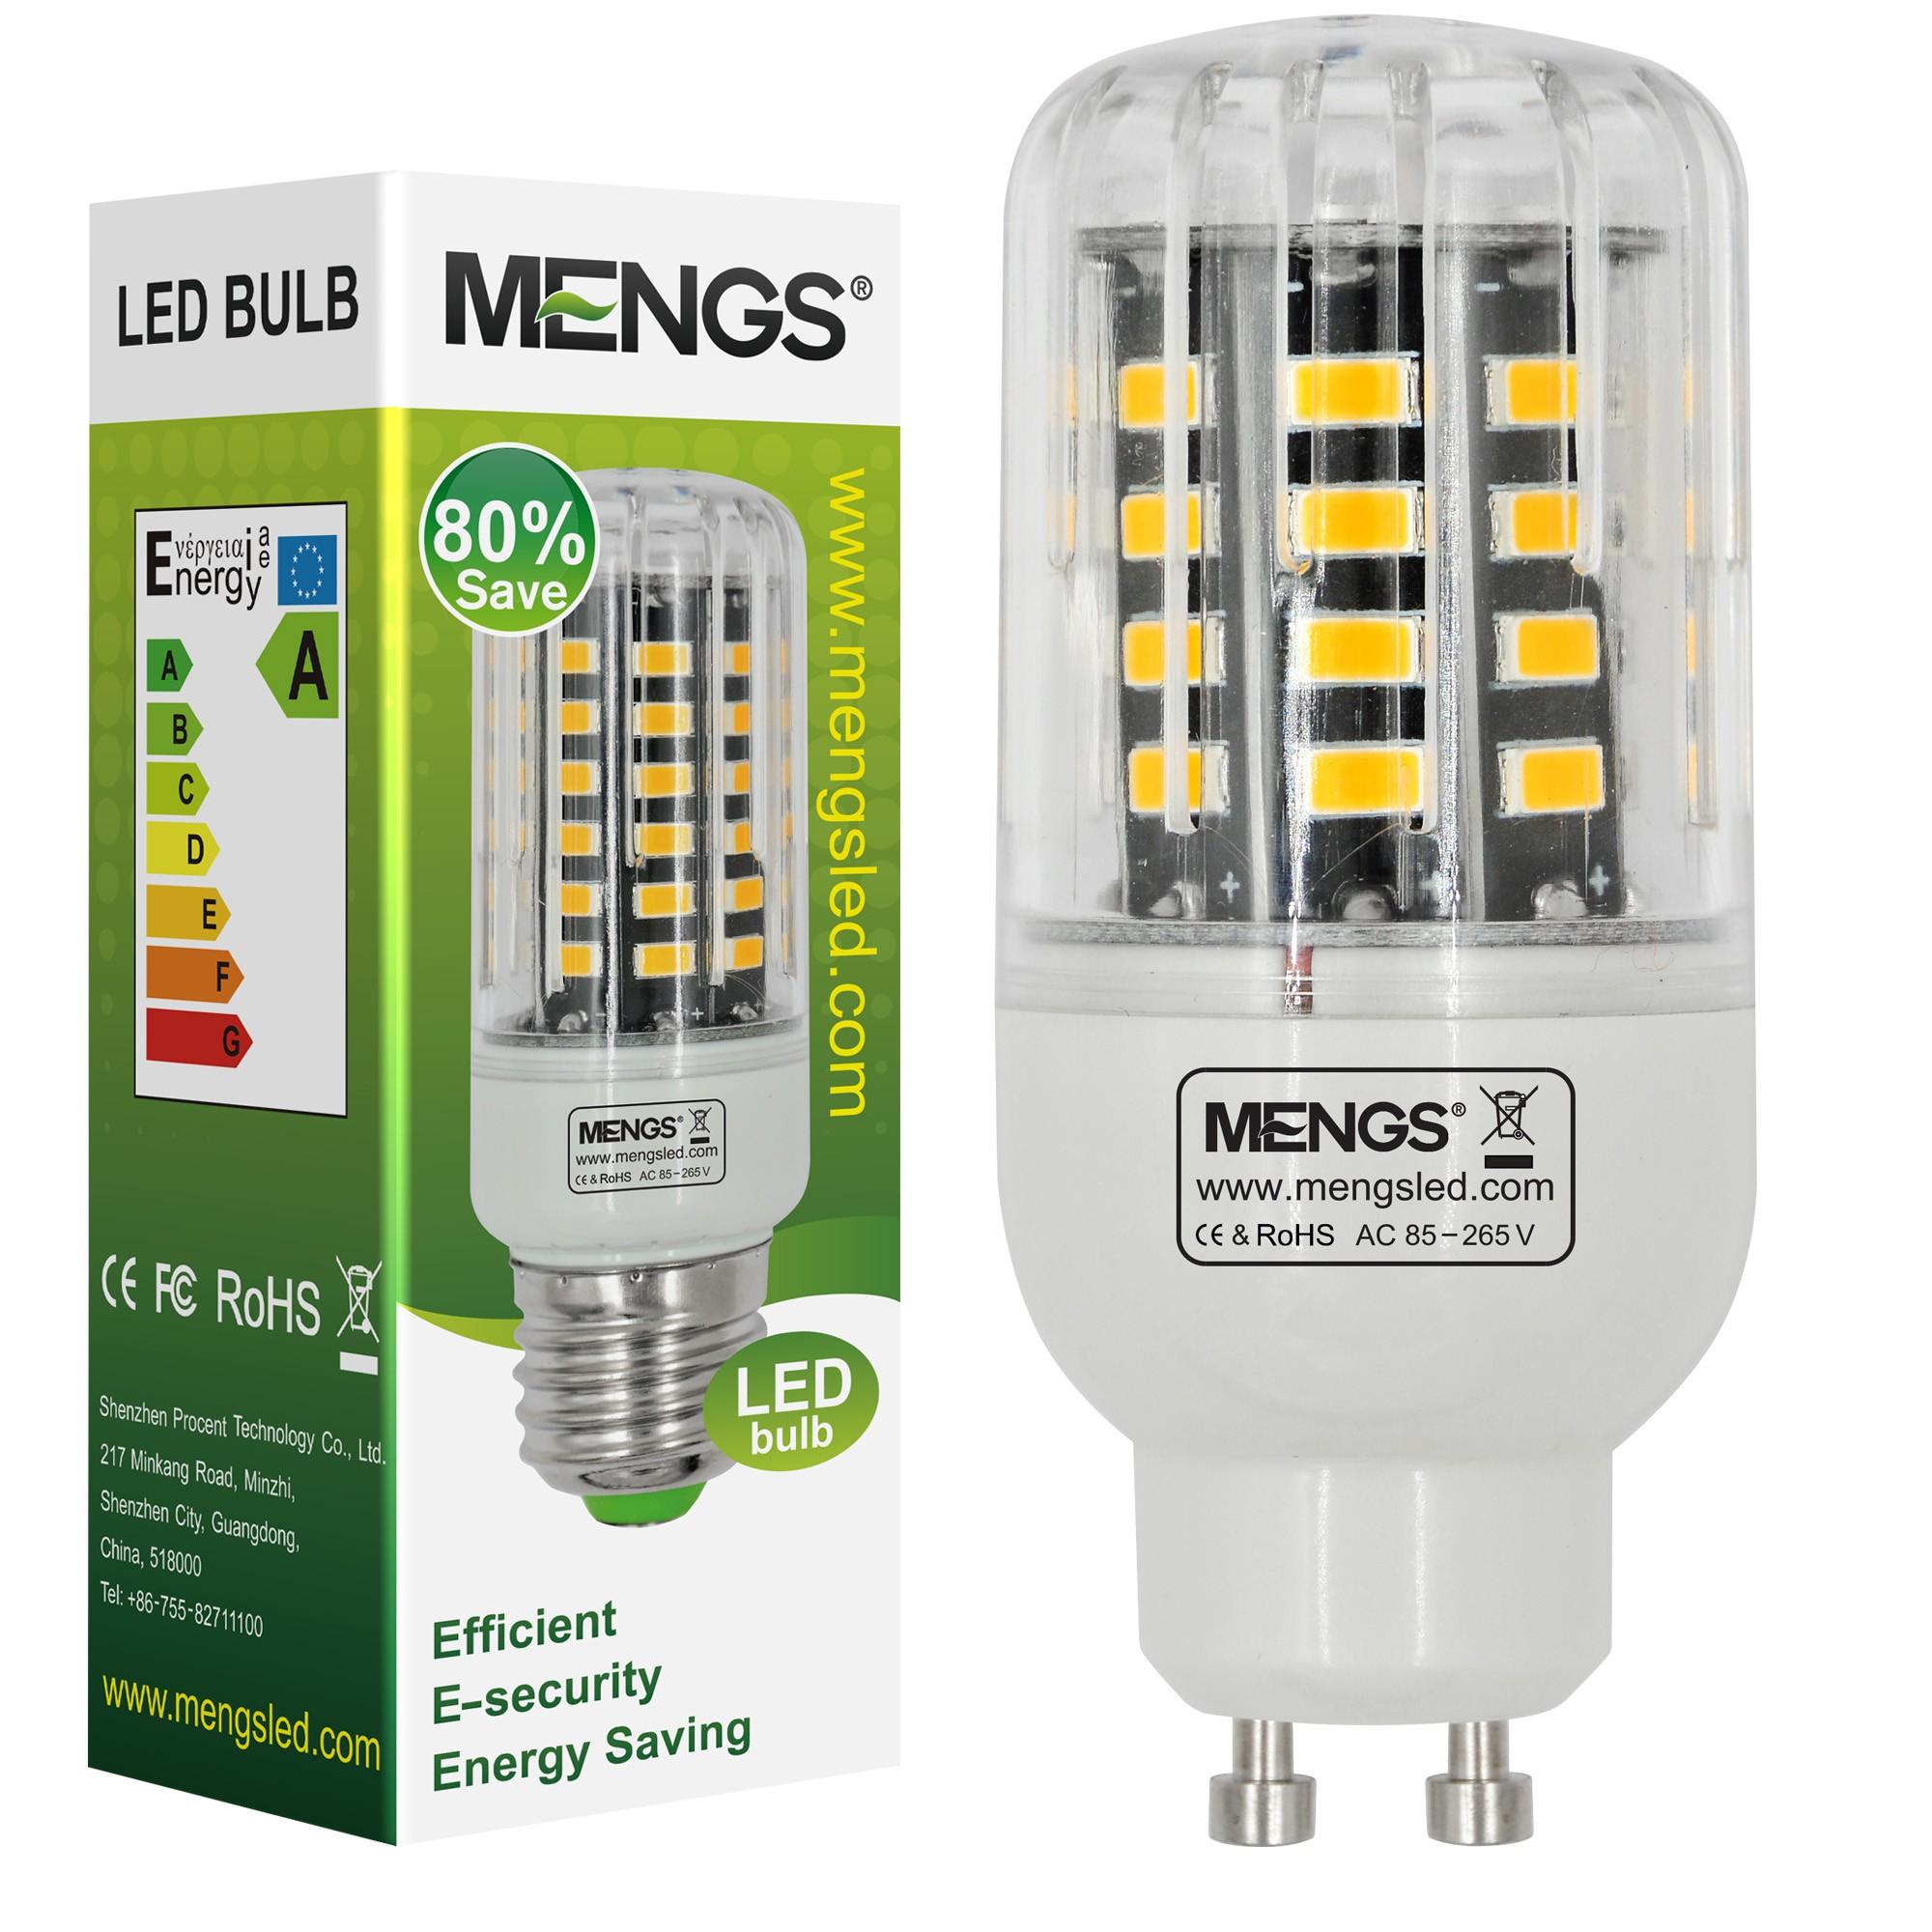 Mengsled Mengs Anti Strobe Gu10 5w Led Corn Light 40x 5736 Smd Led Bulb Lamp In Warm White